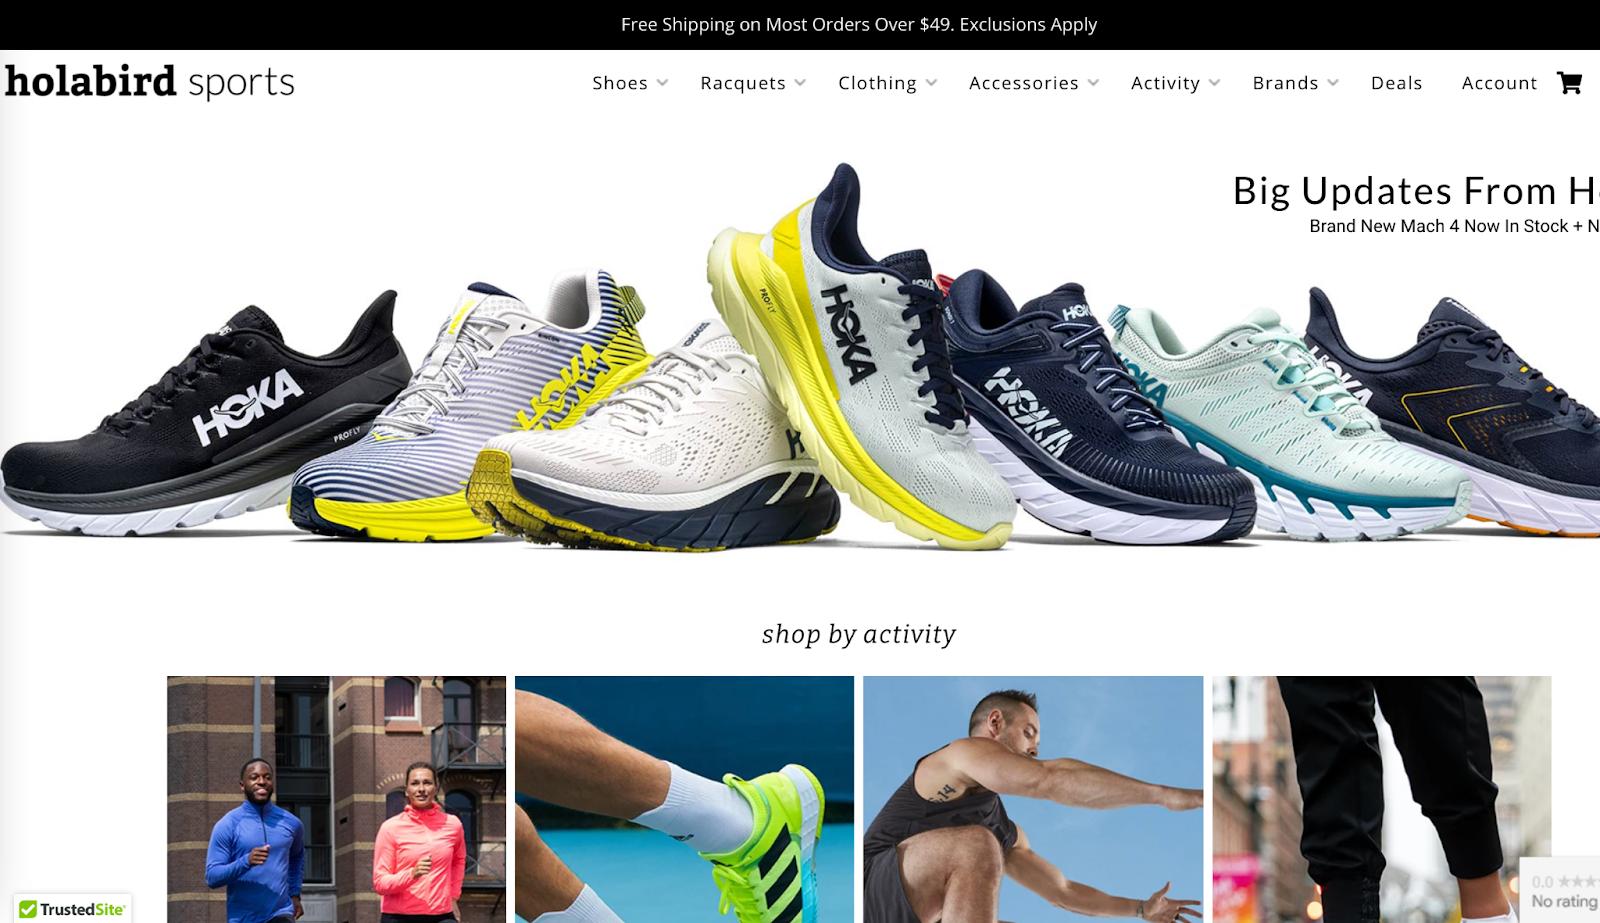 holabird sports homepage 1